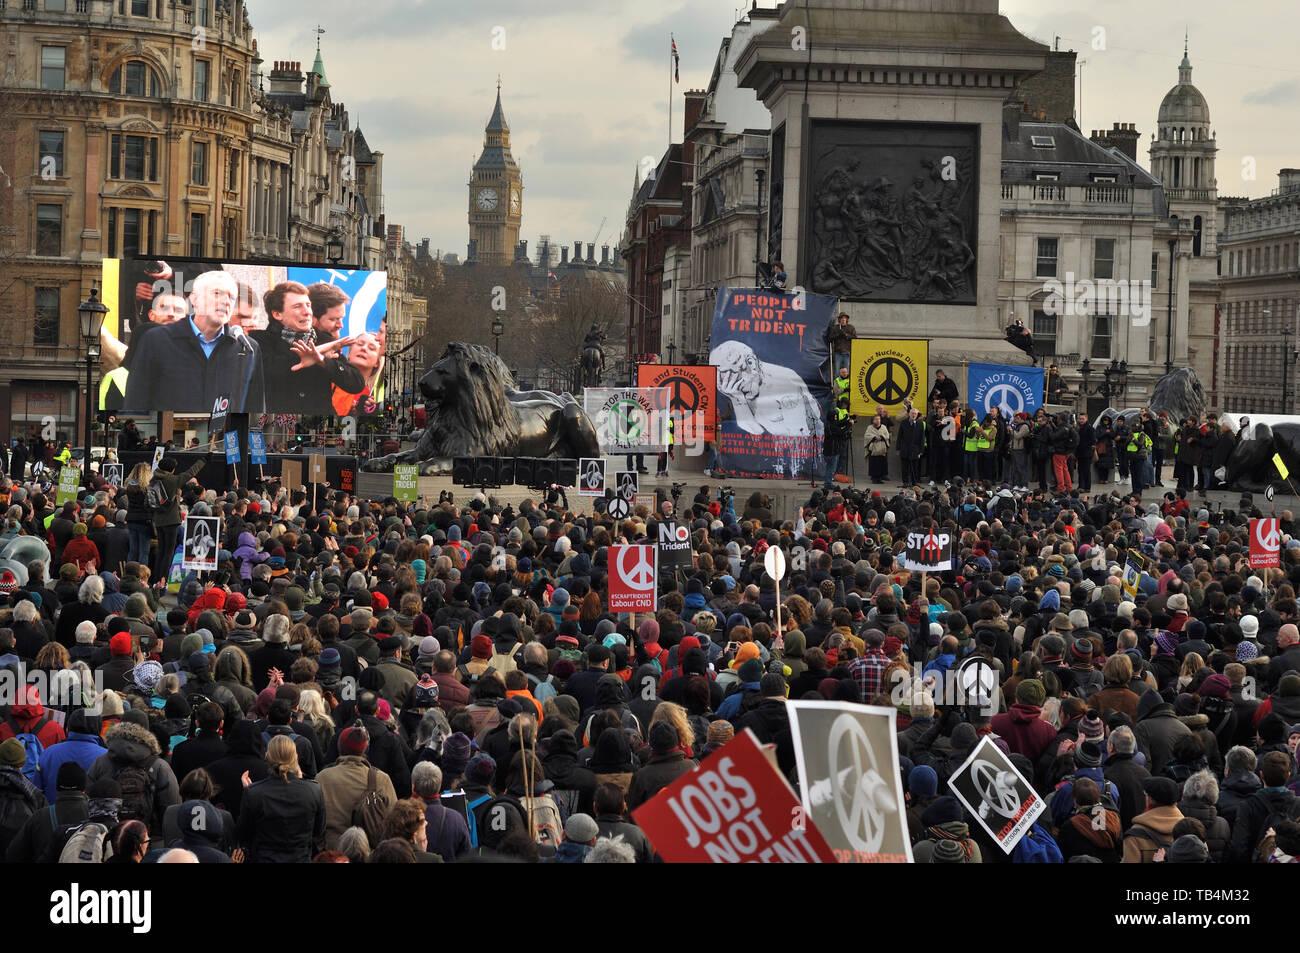 Cde Trident rally, Londres, Febrero de 2016 Imagen De Stock